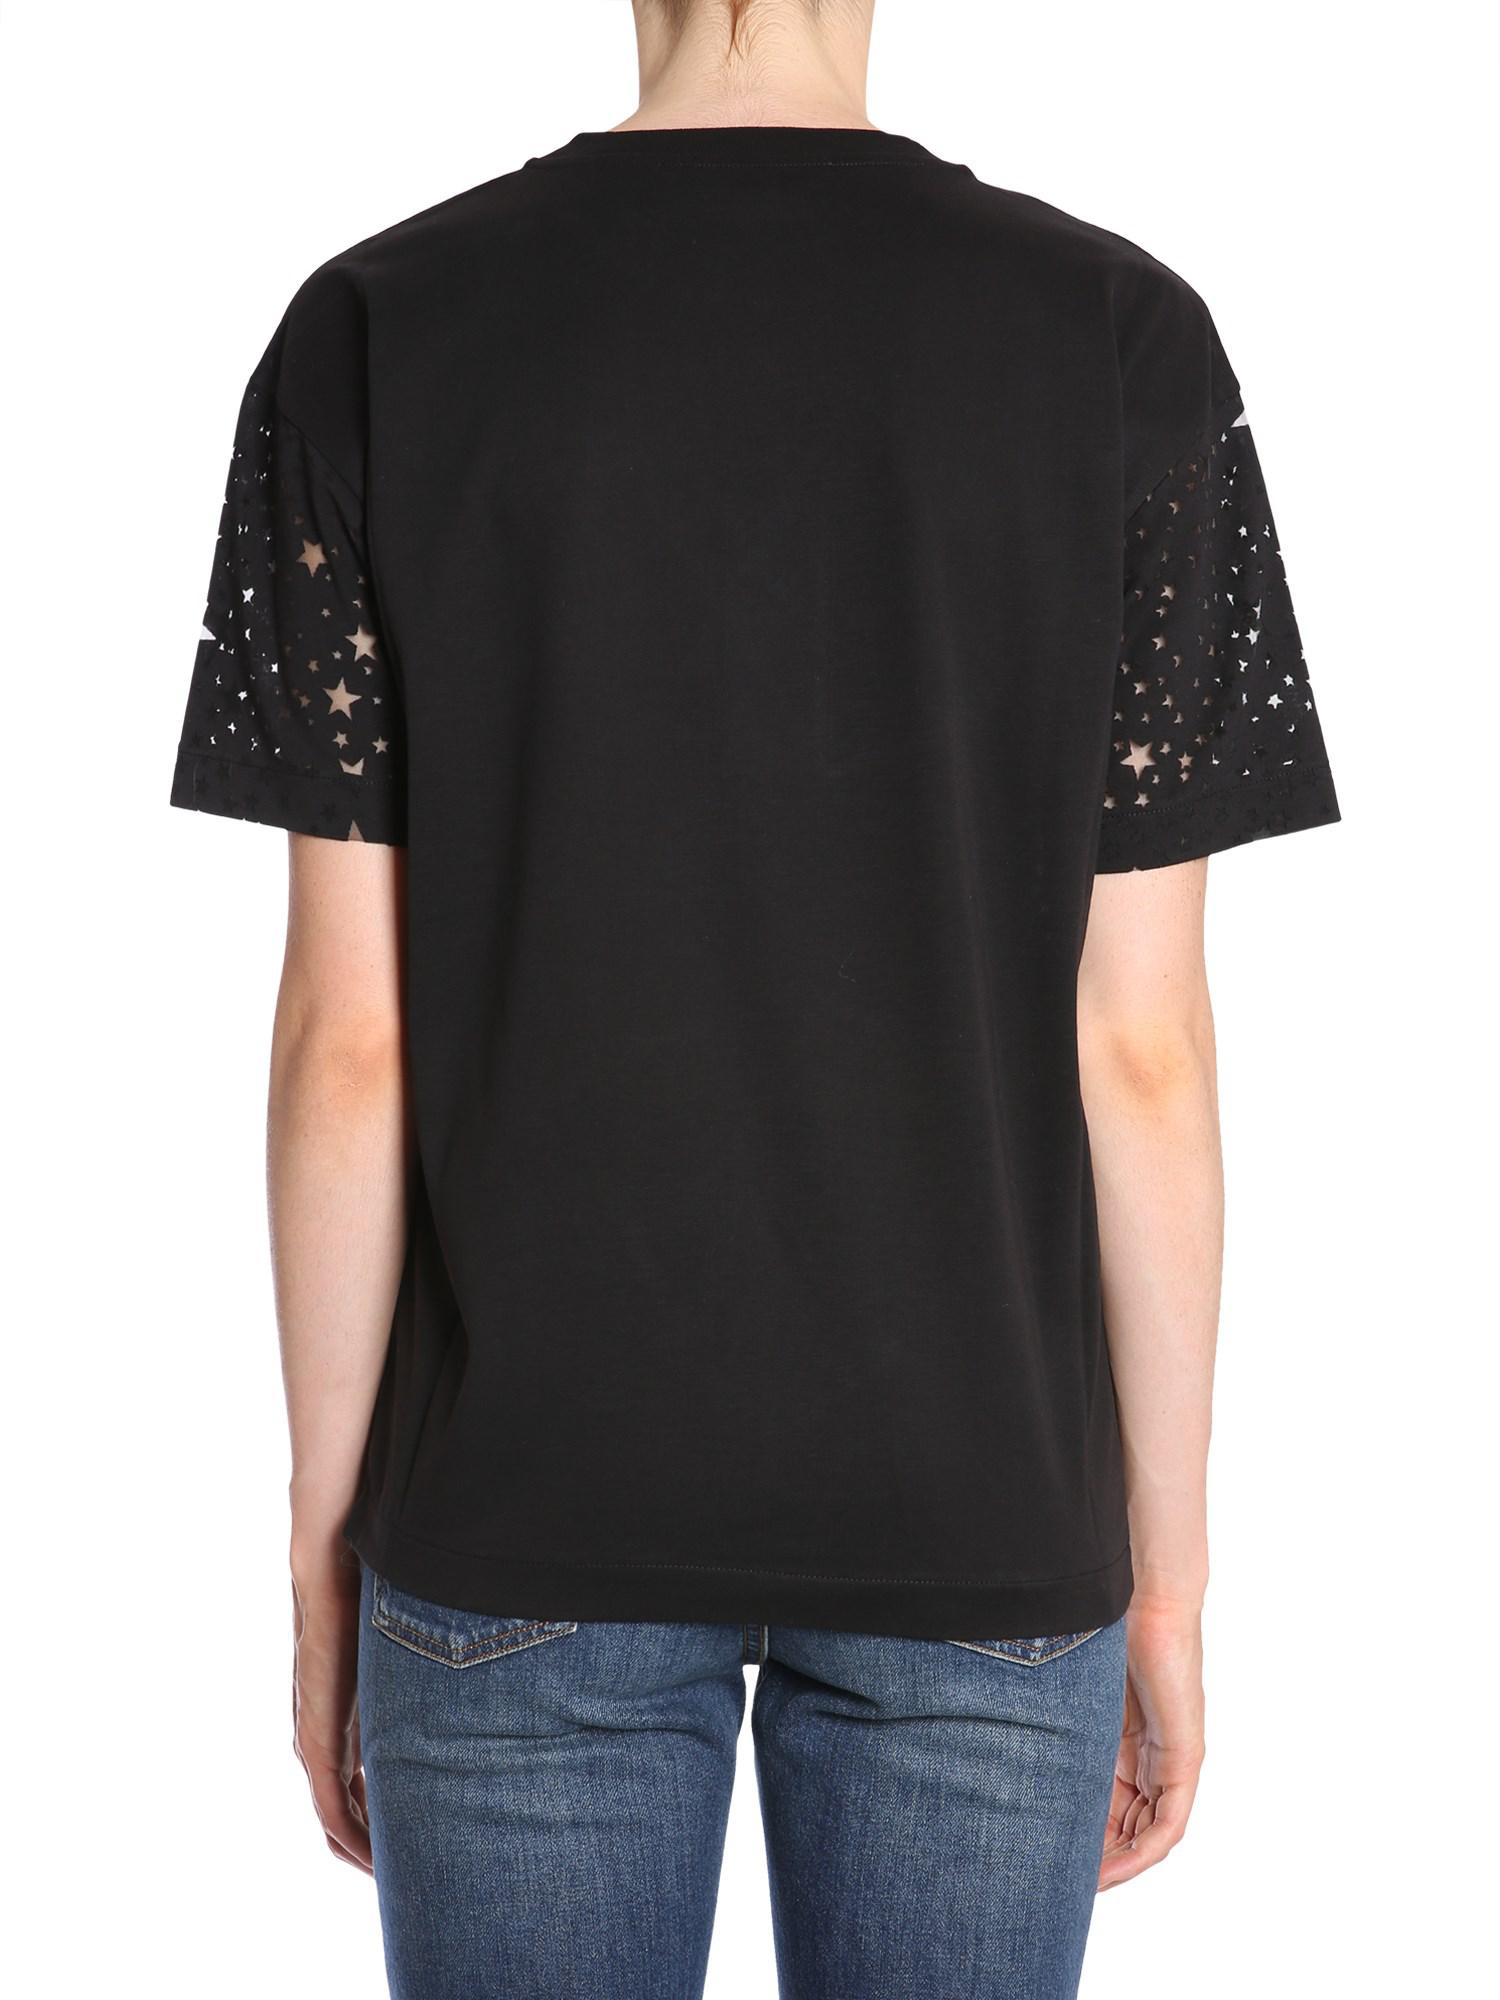 13fbd97ef2a stella-mccartney-BLACK-Round-Collar-Cotton-Jersey-T-shirt-With-Carved-Stars.jpeg